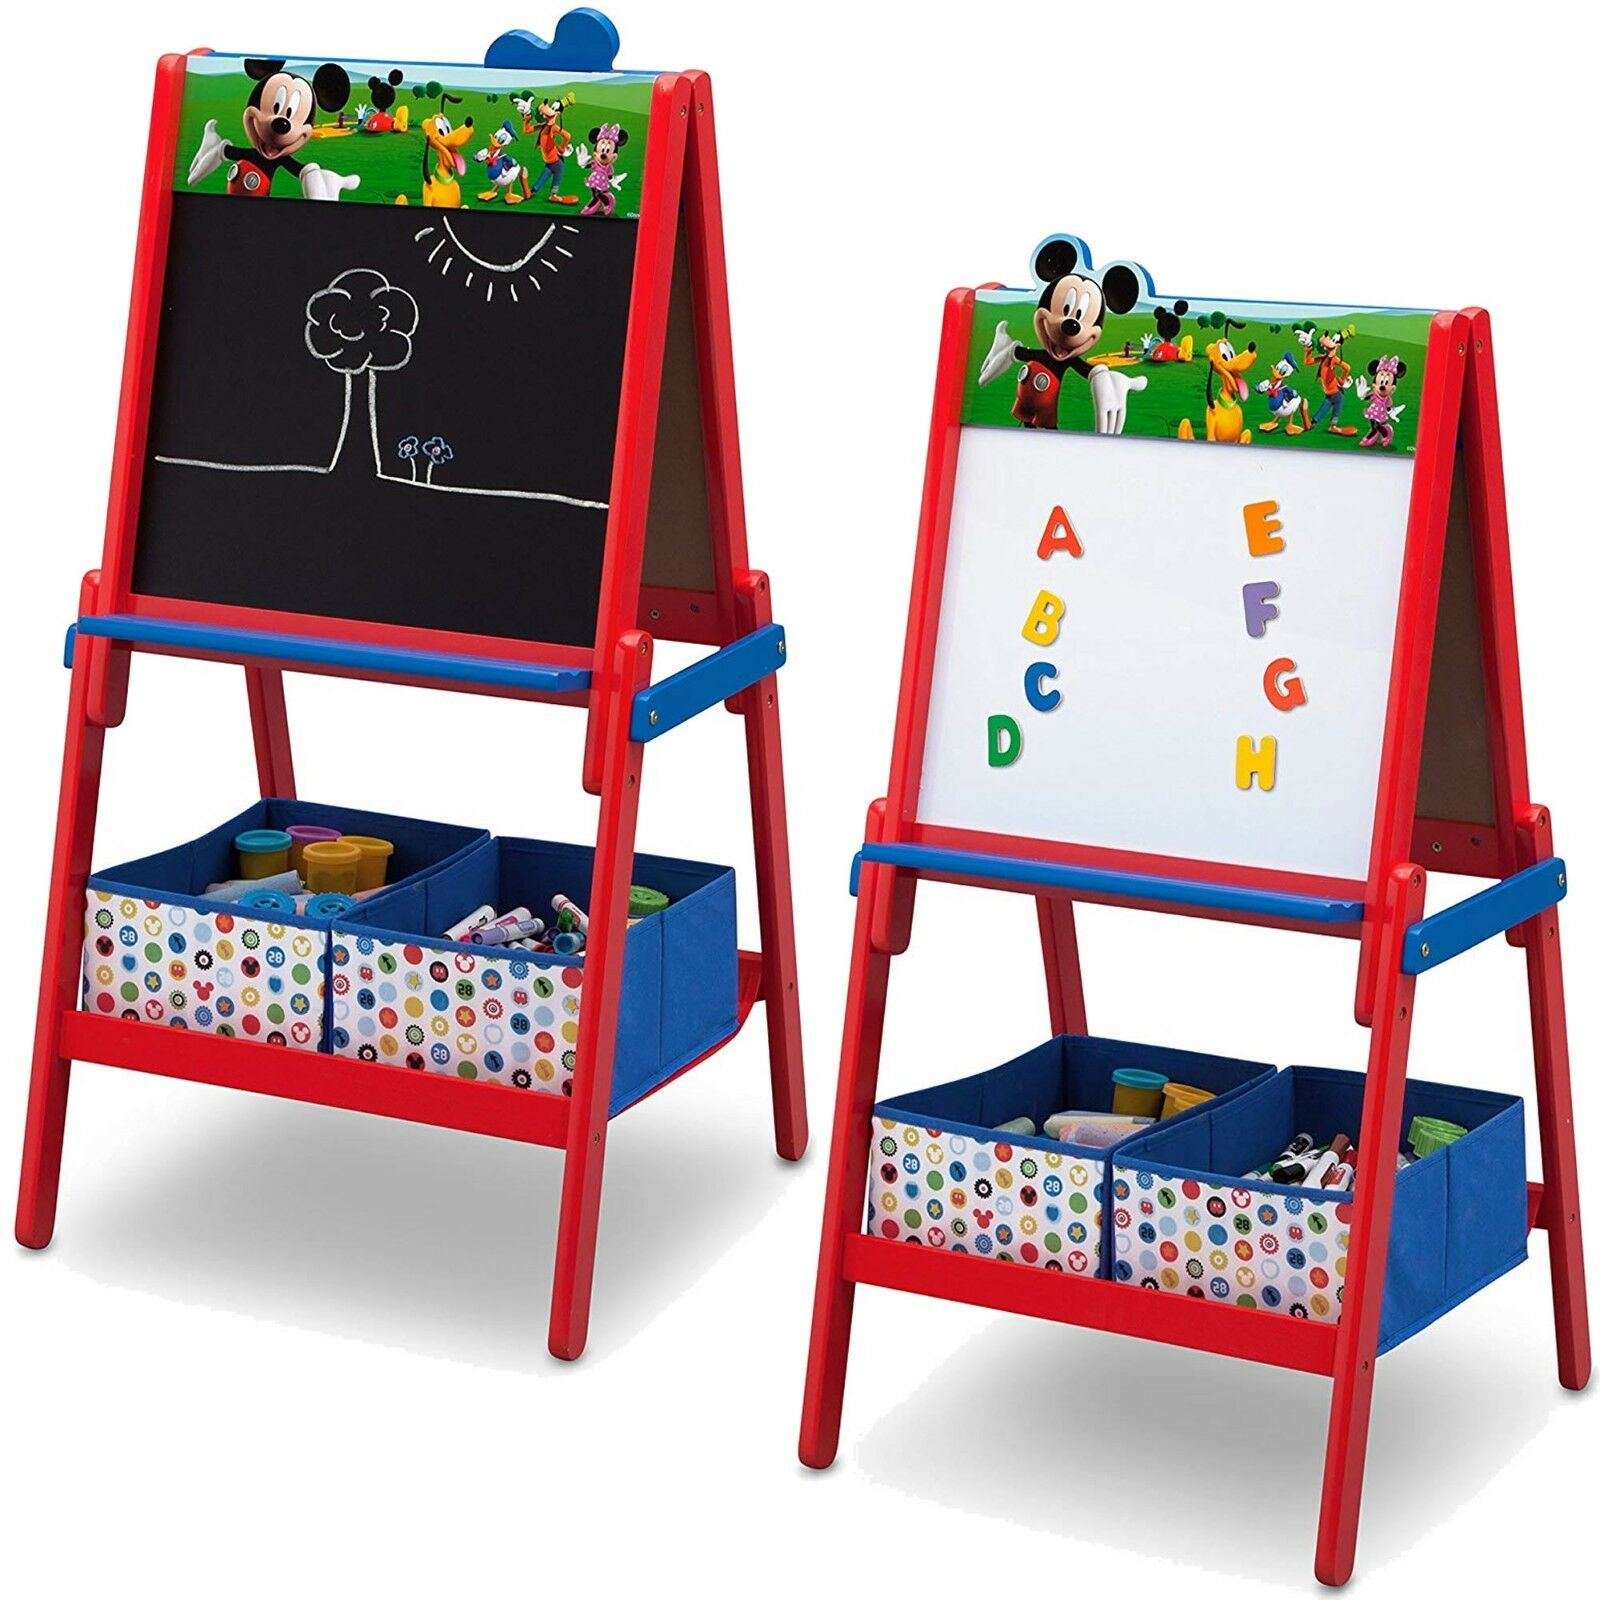 GROß Maltafel Zaubertafel Kindermaltafe Kinder Spielzeug Kindergeburtstag